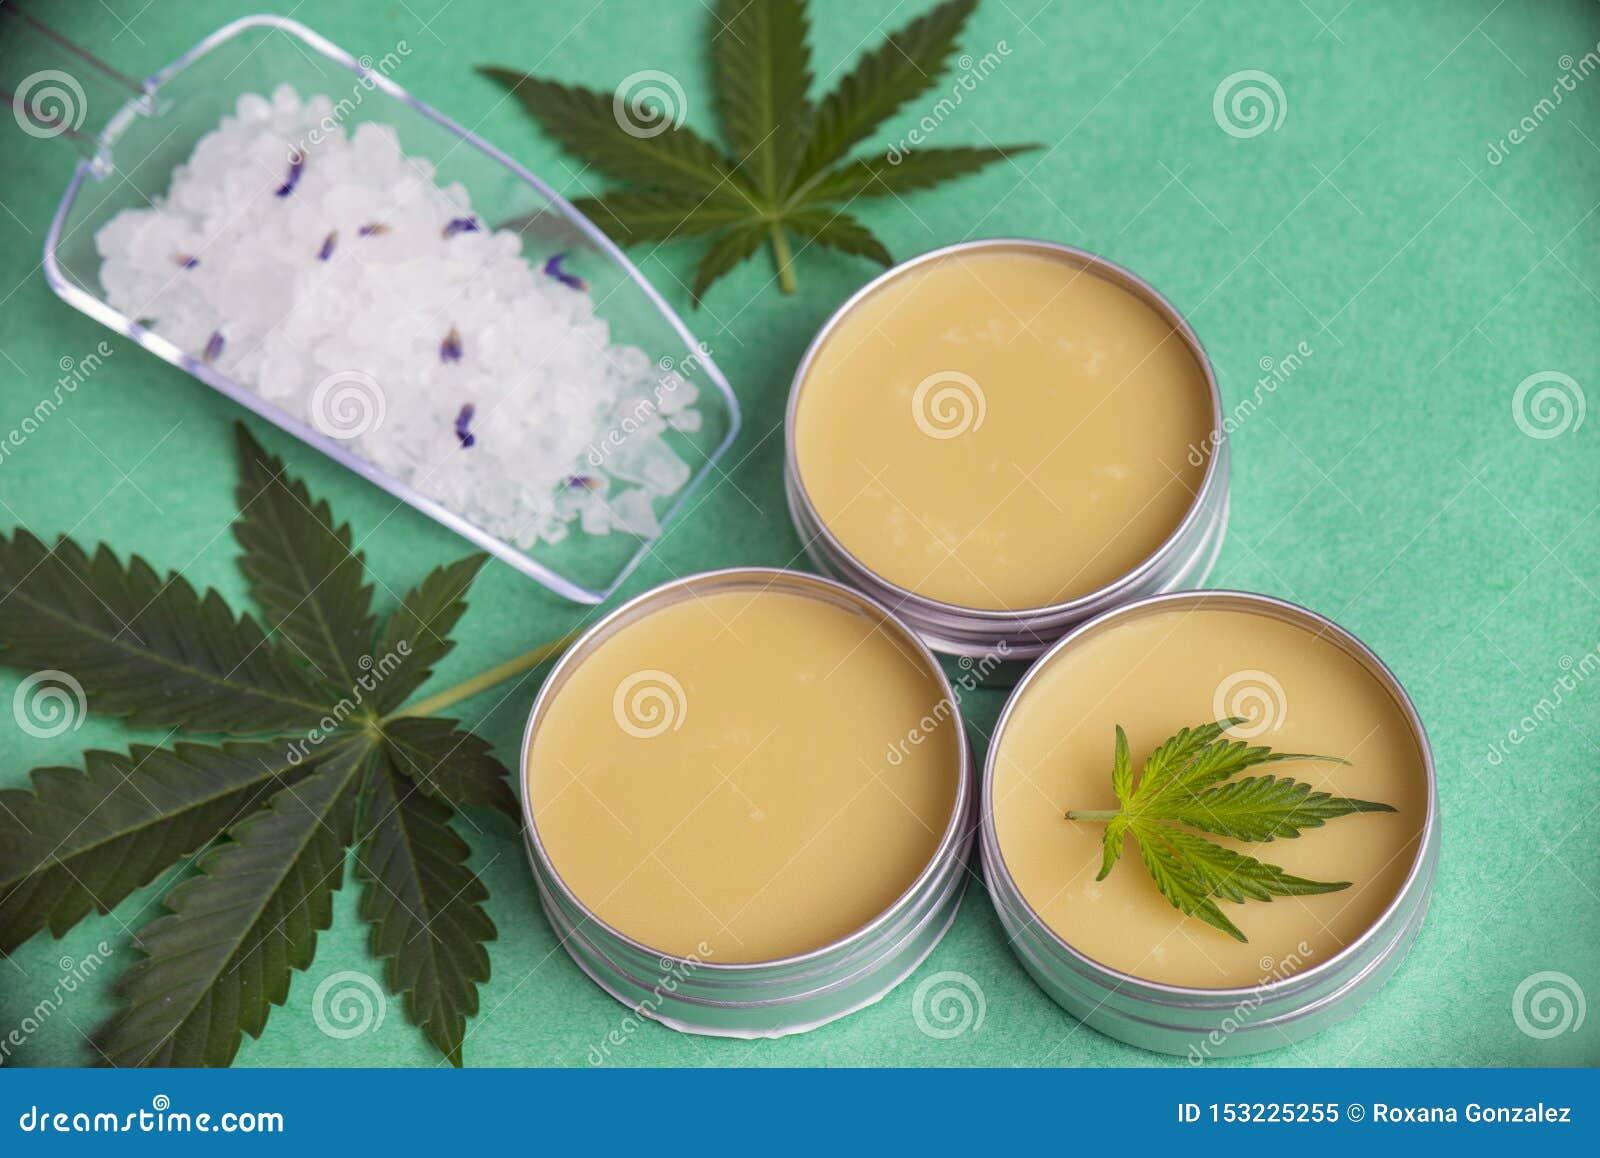 Лекарство из конопли на молоке конопля ядовитое растение